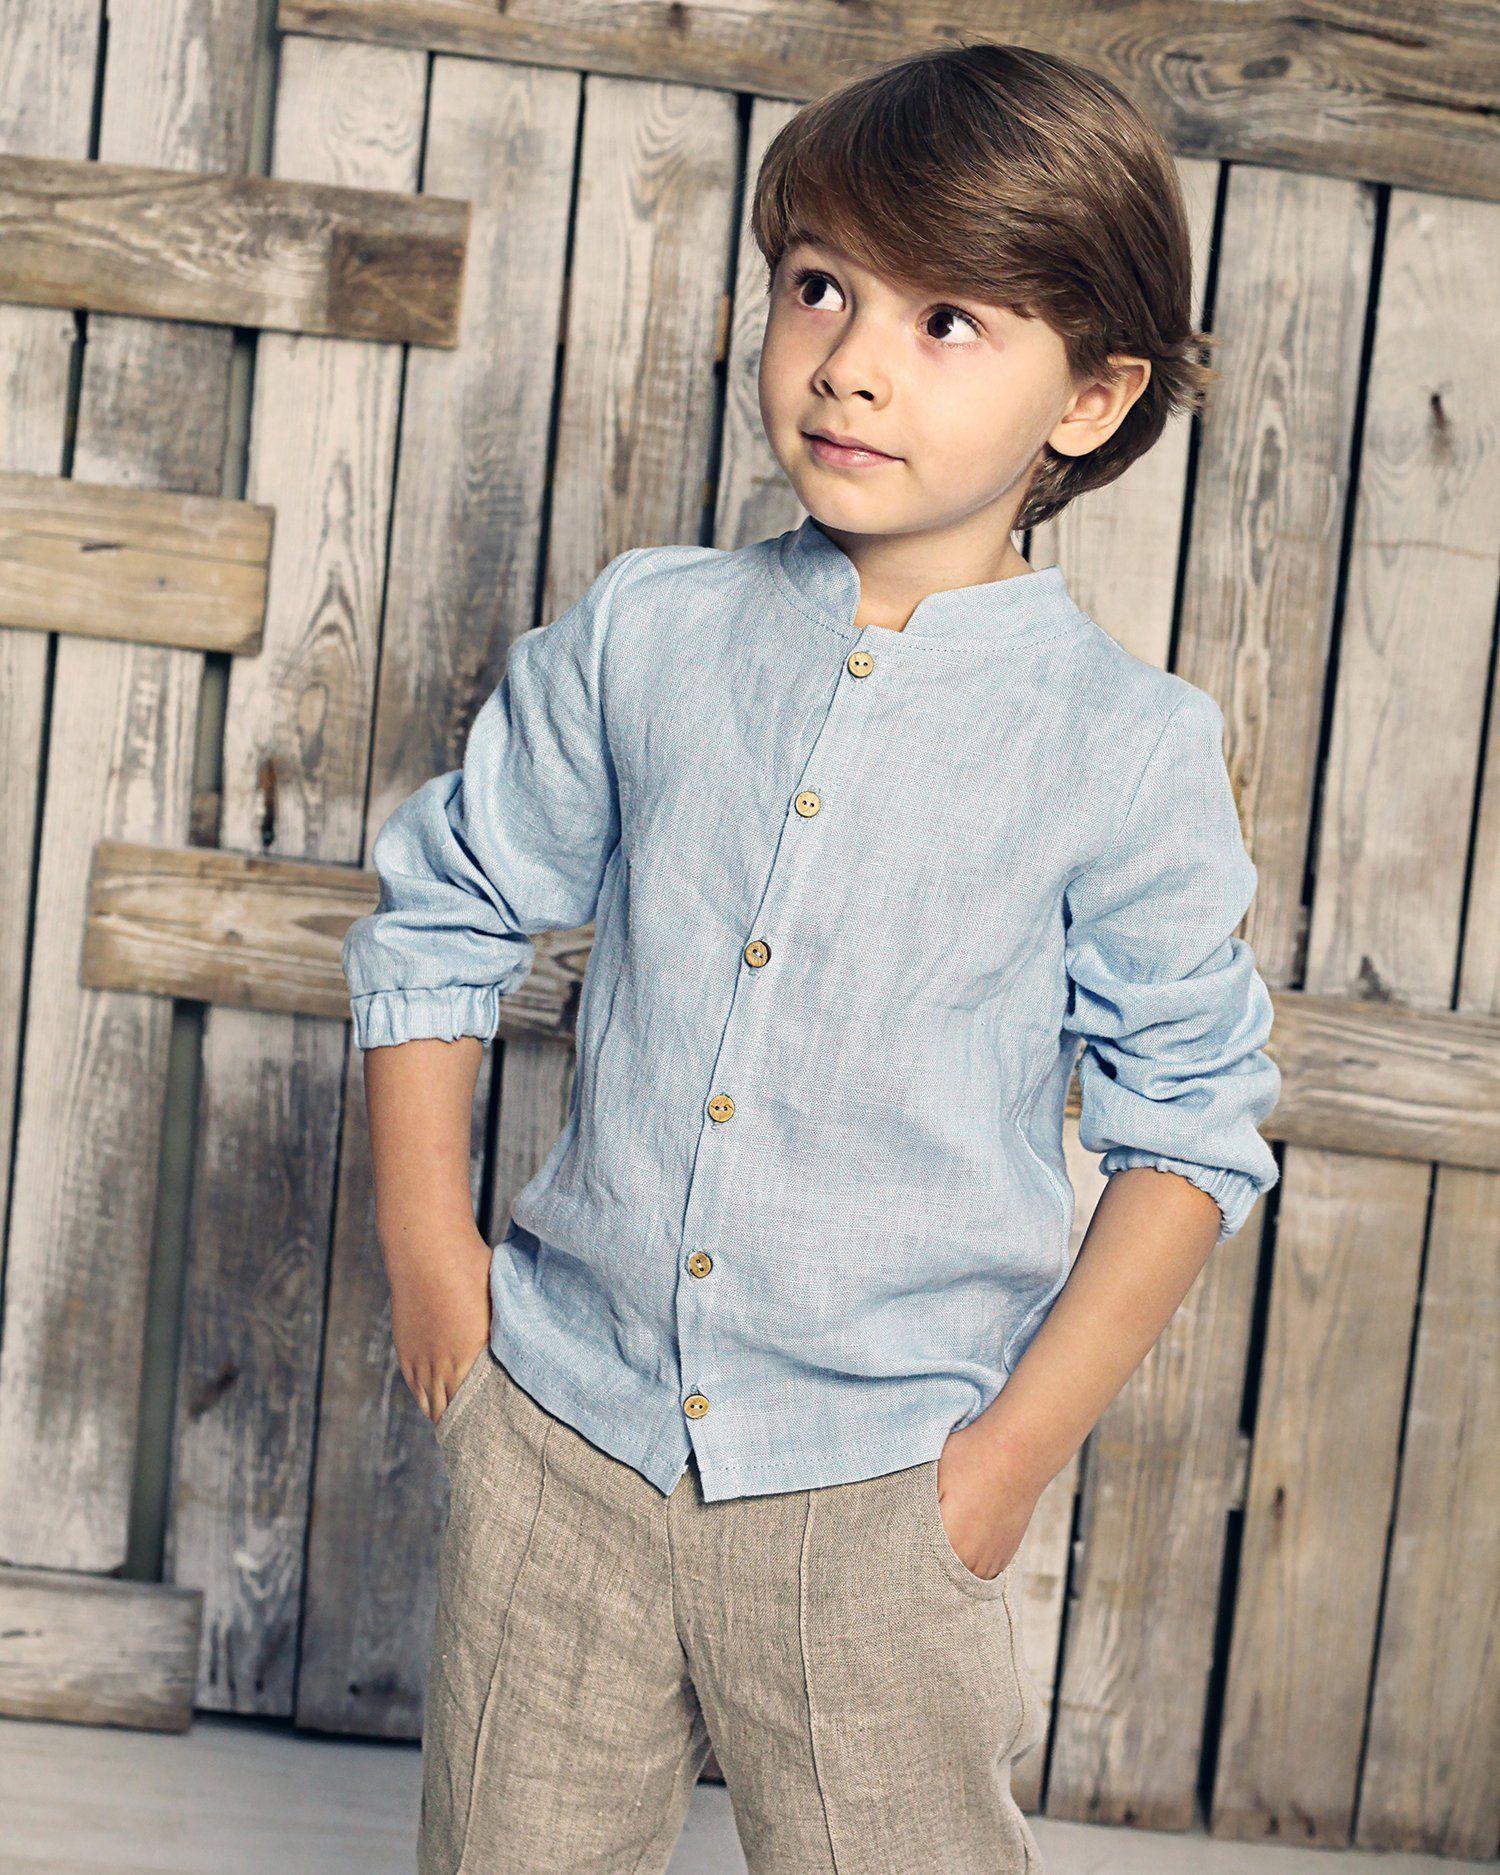 24++ Dress shirts for boy ideas in 2021